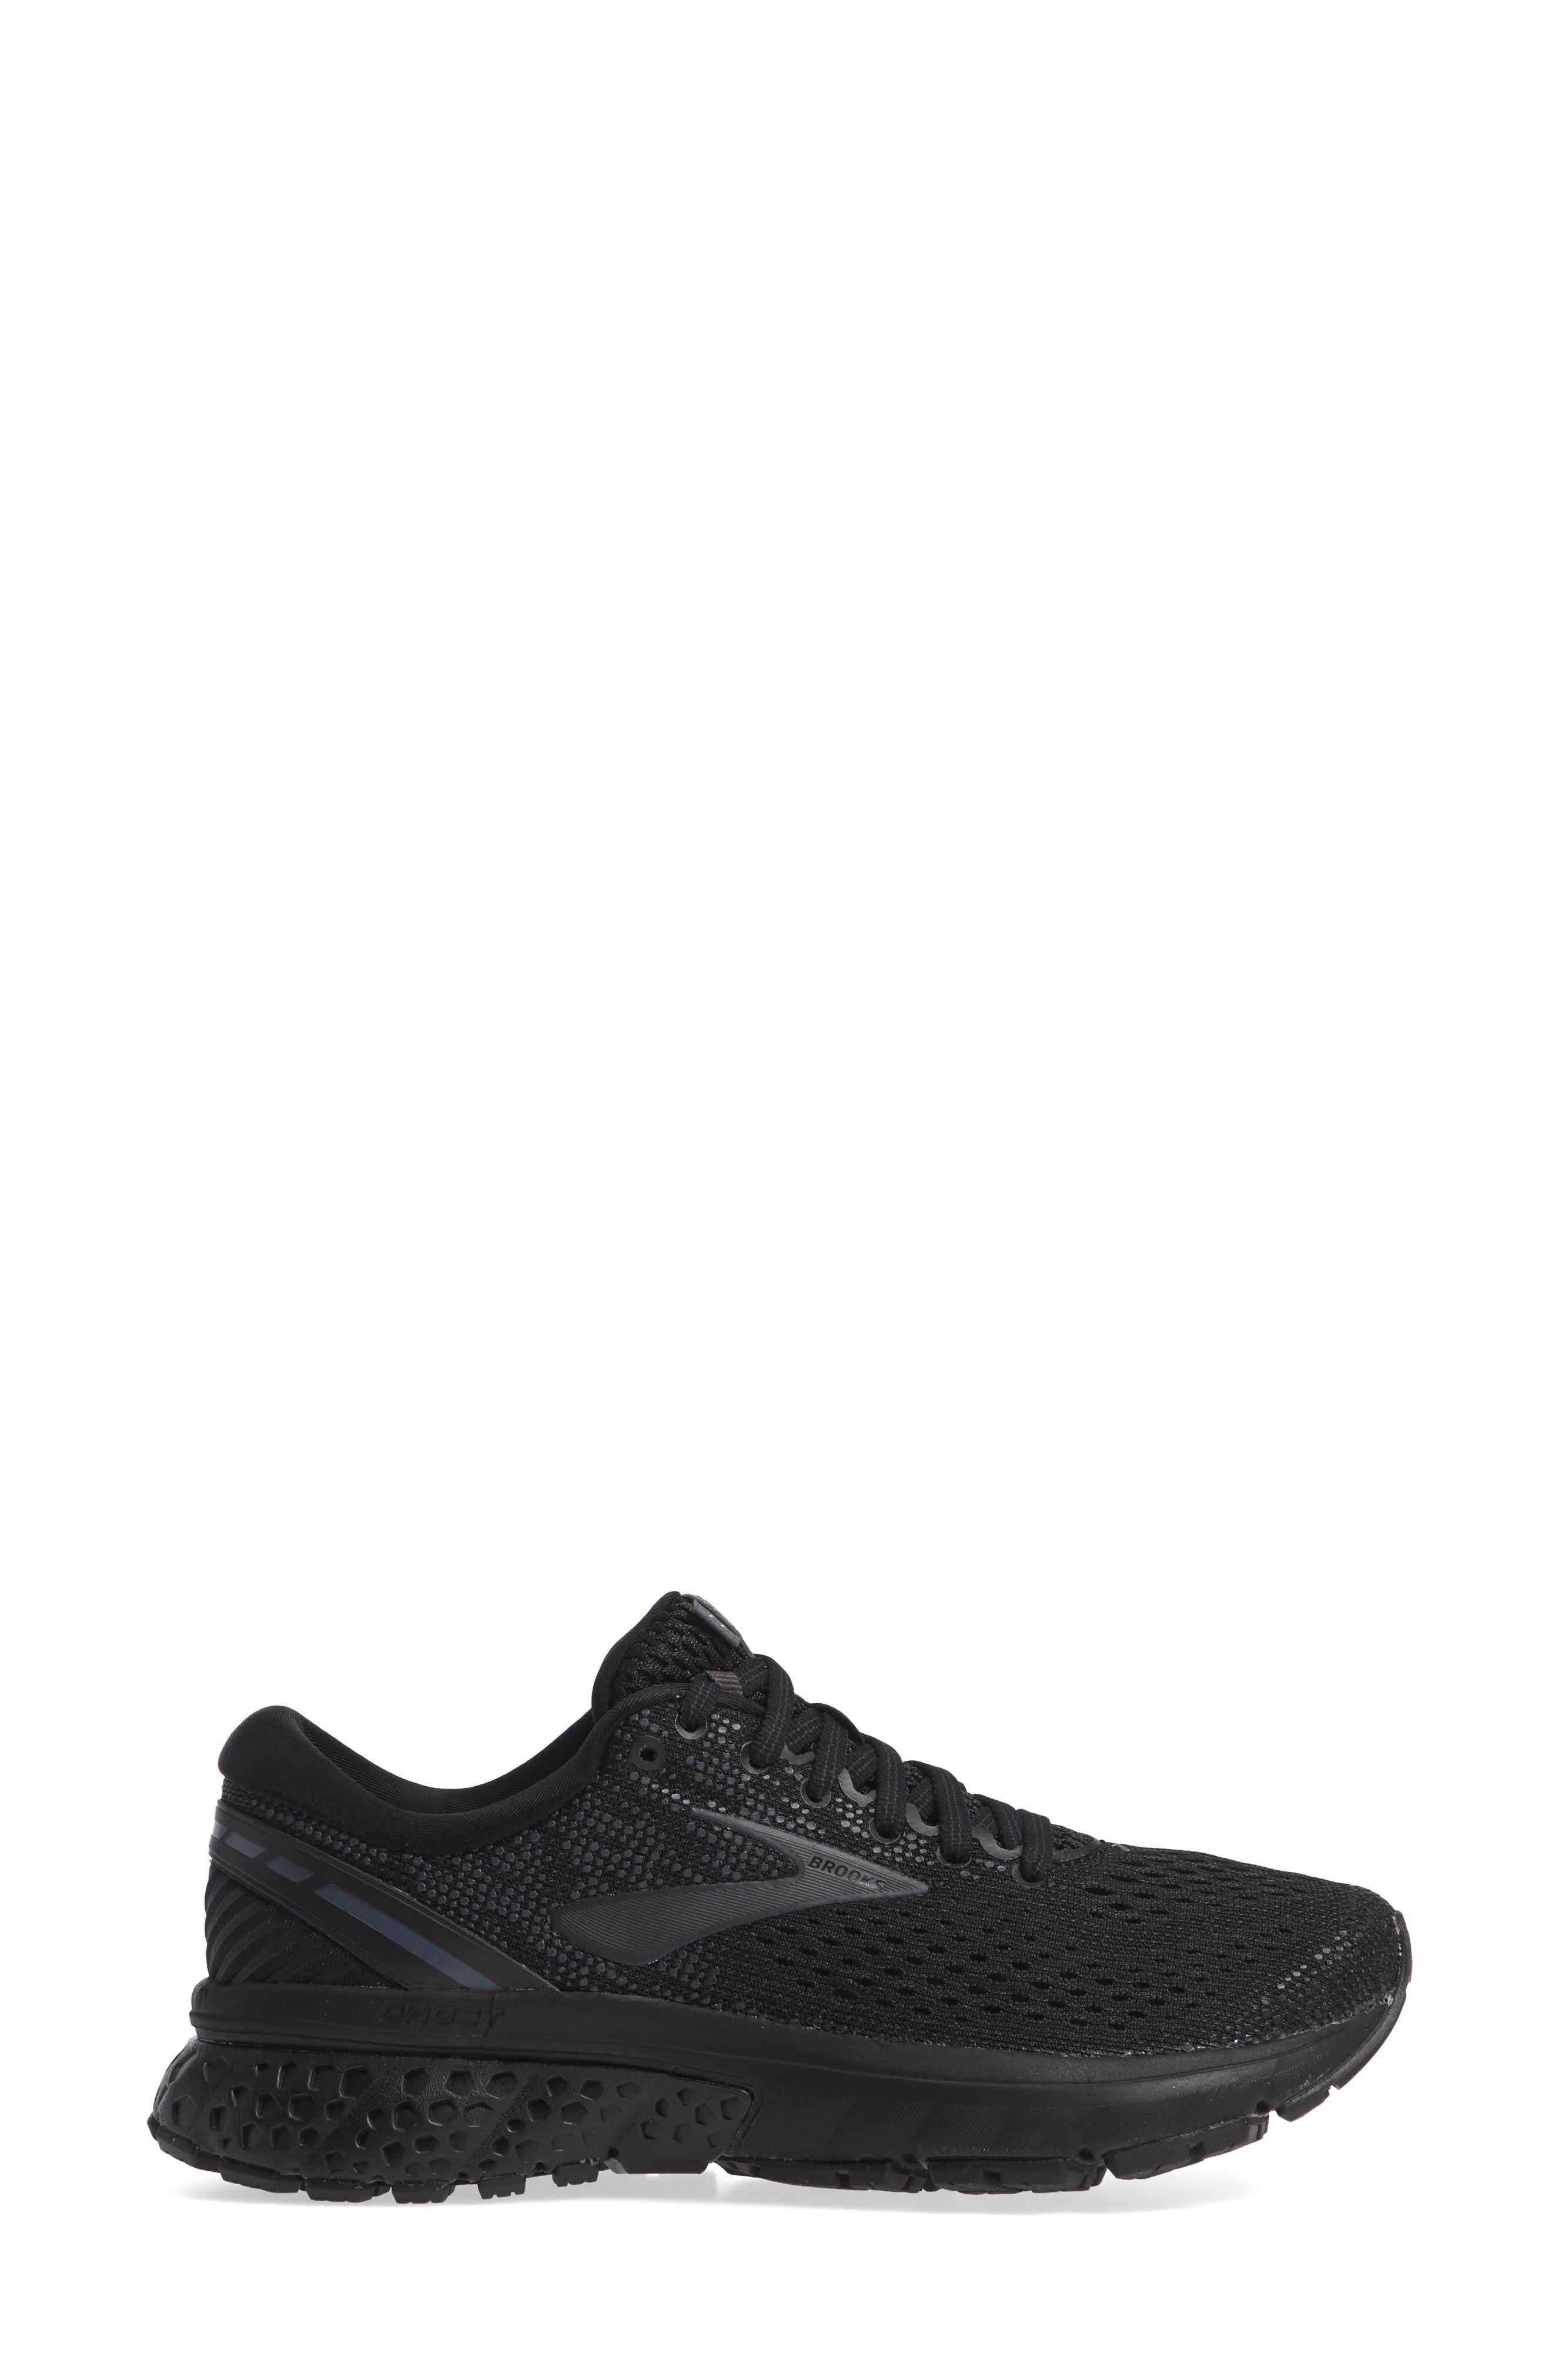 BROOKS, Ghost 11 Running Shoe, Alternate thumbnail 3, color, BLACK/ EBONY